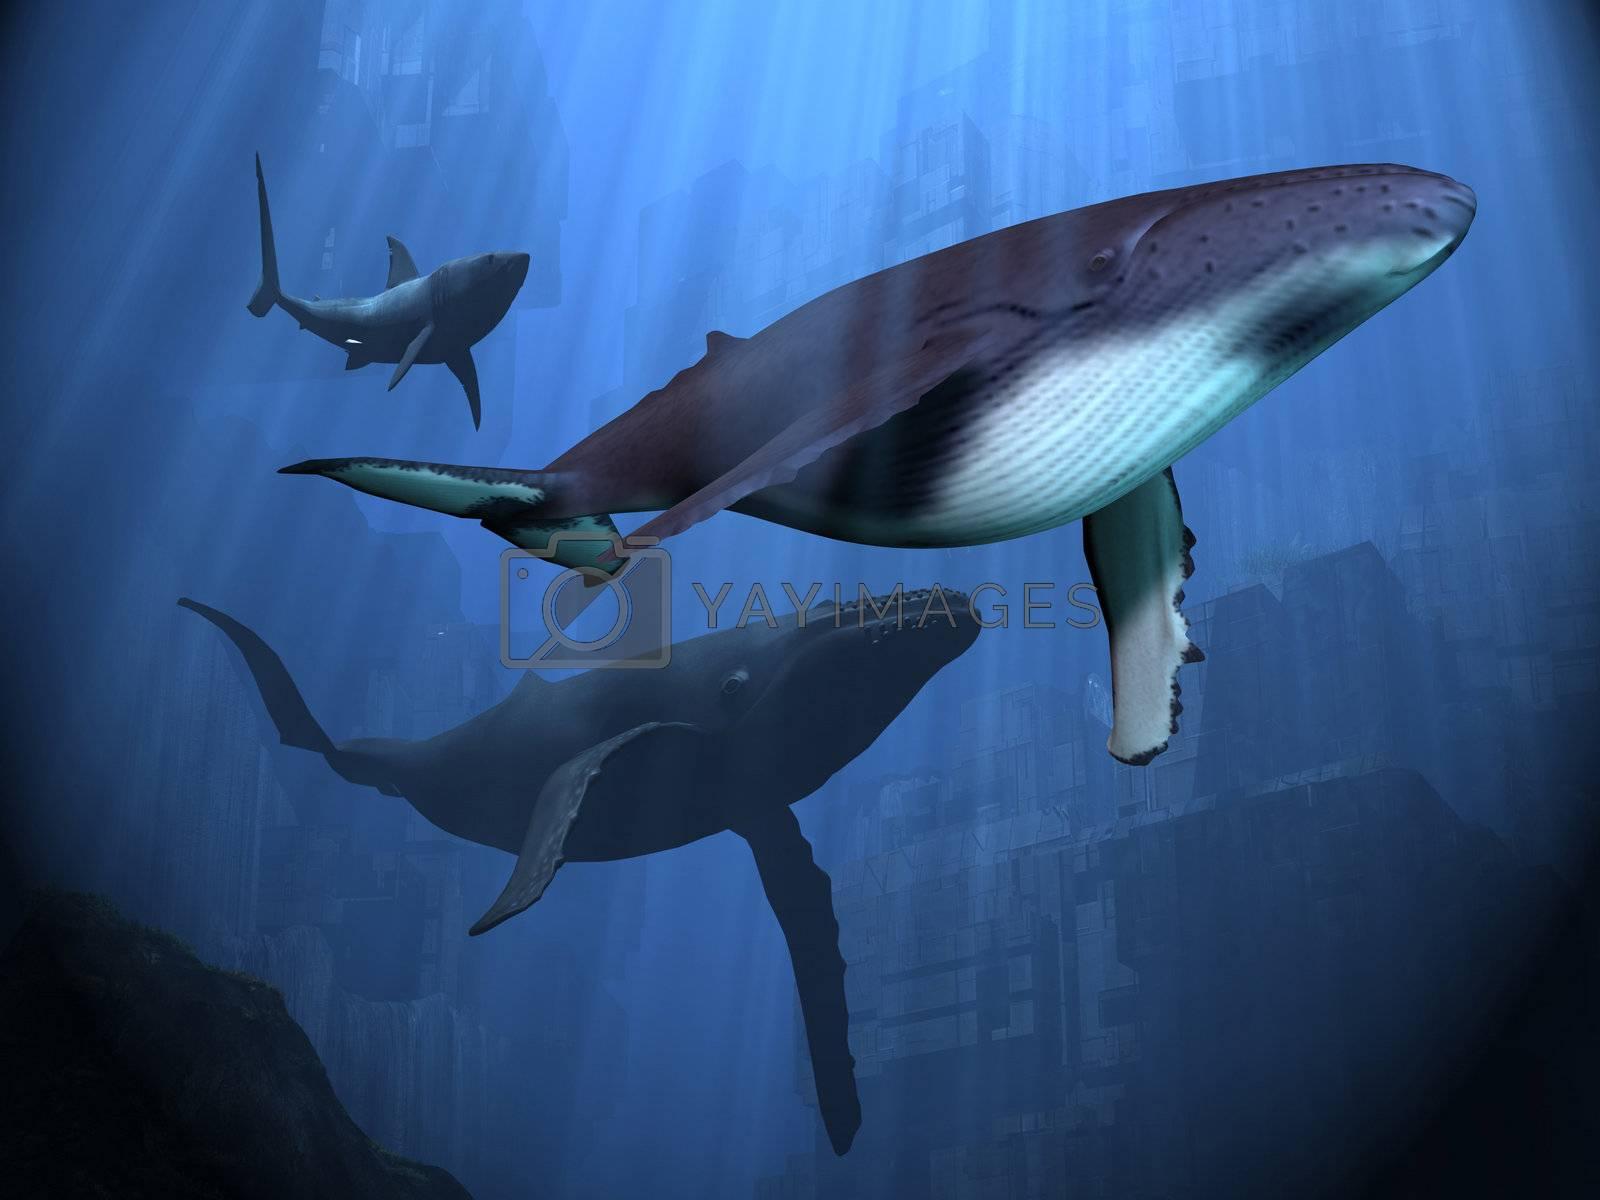 Royalty free image of OCEAN RUINS by Catmando